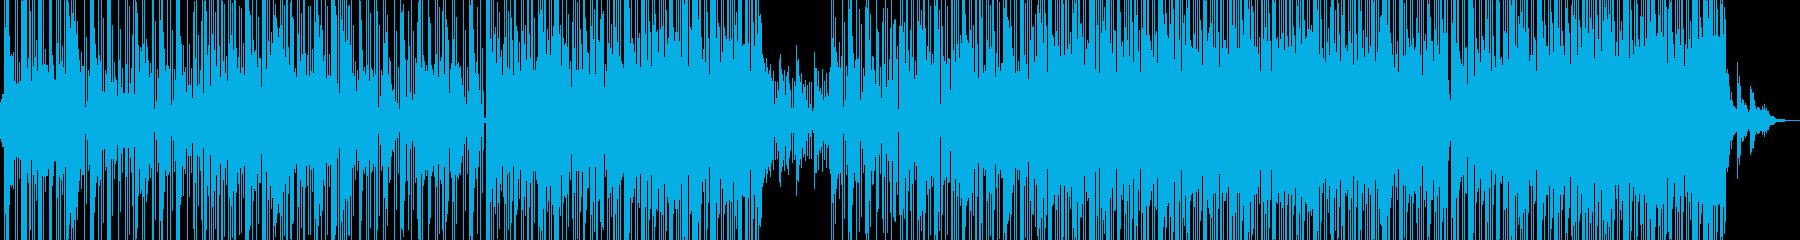 Saxophone, mellow air, R & B short +'s reproduced waveform